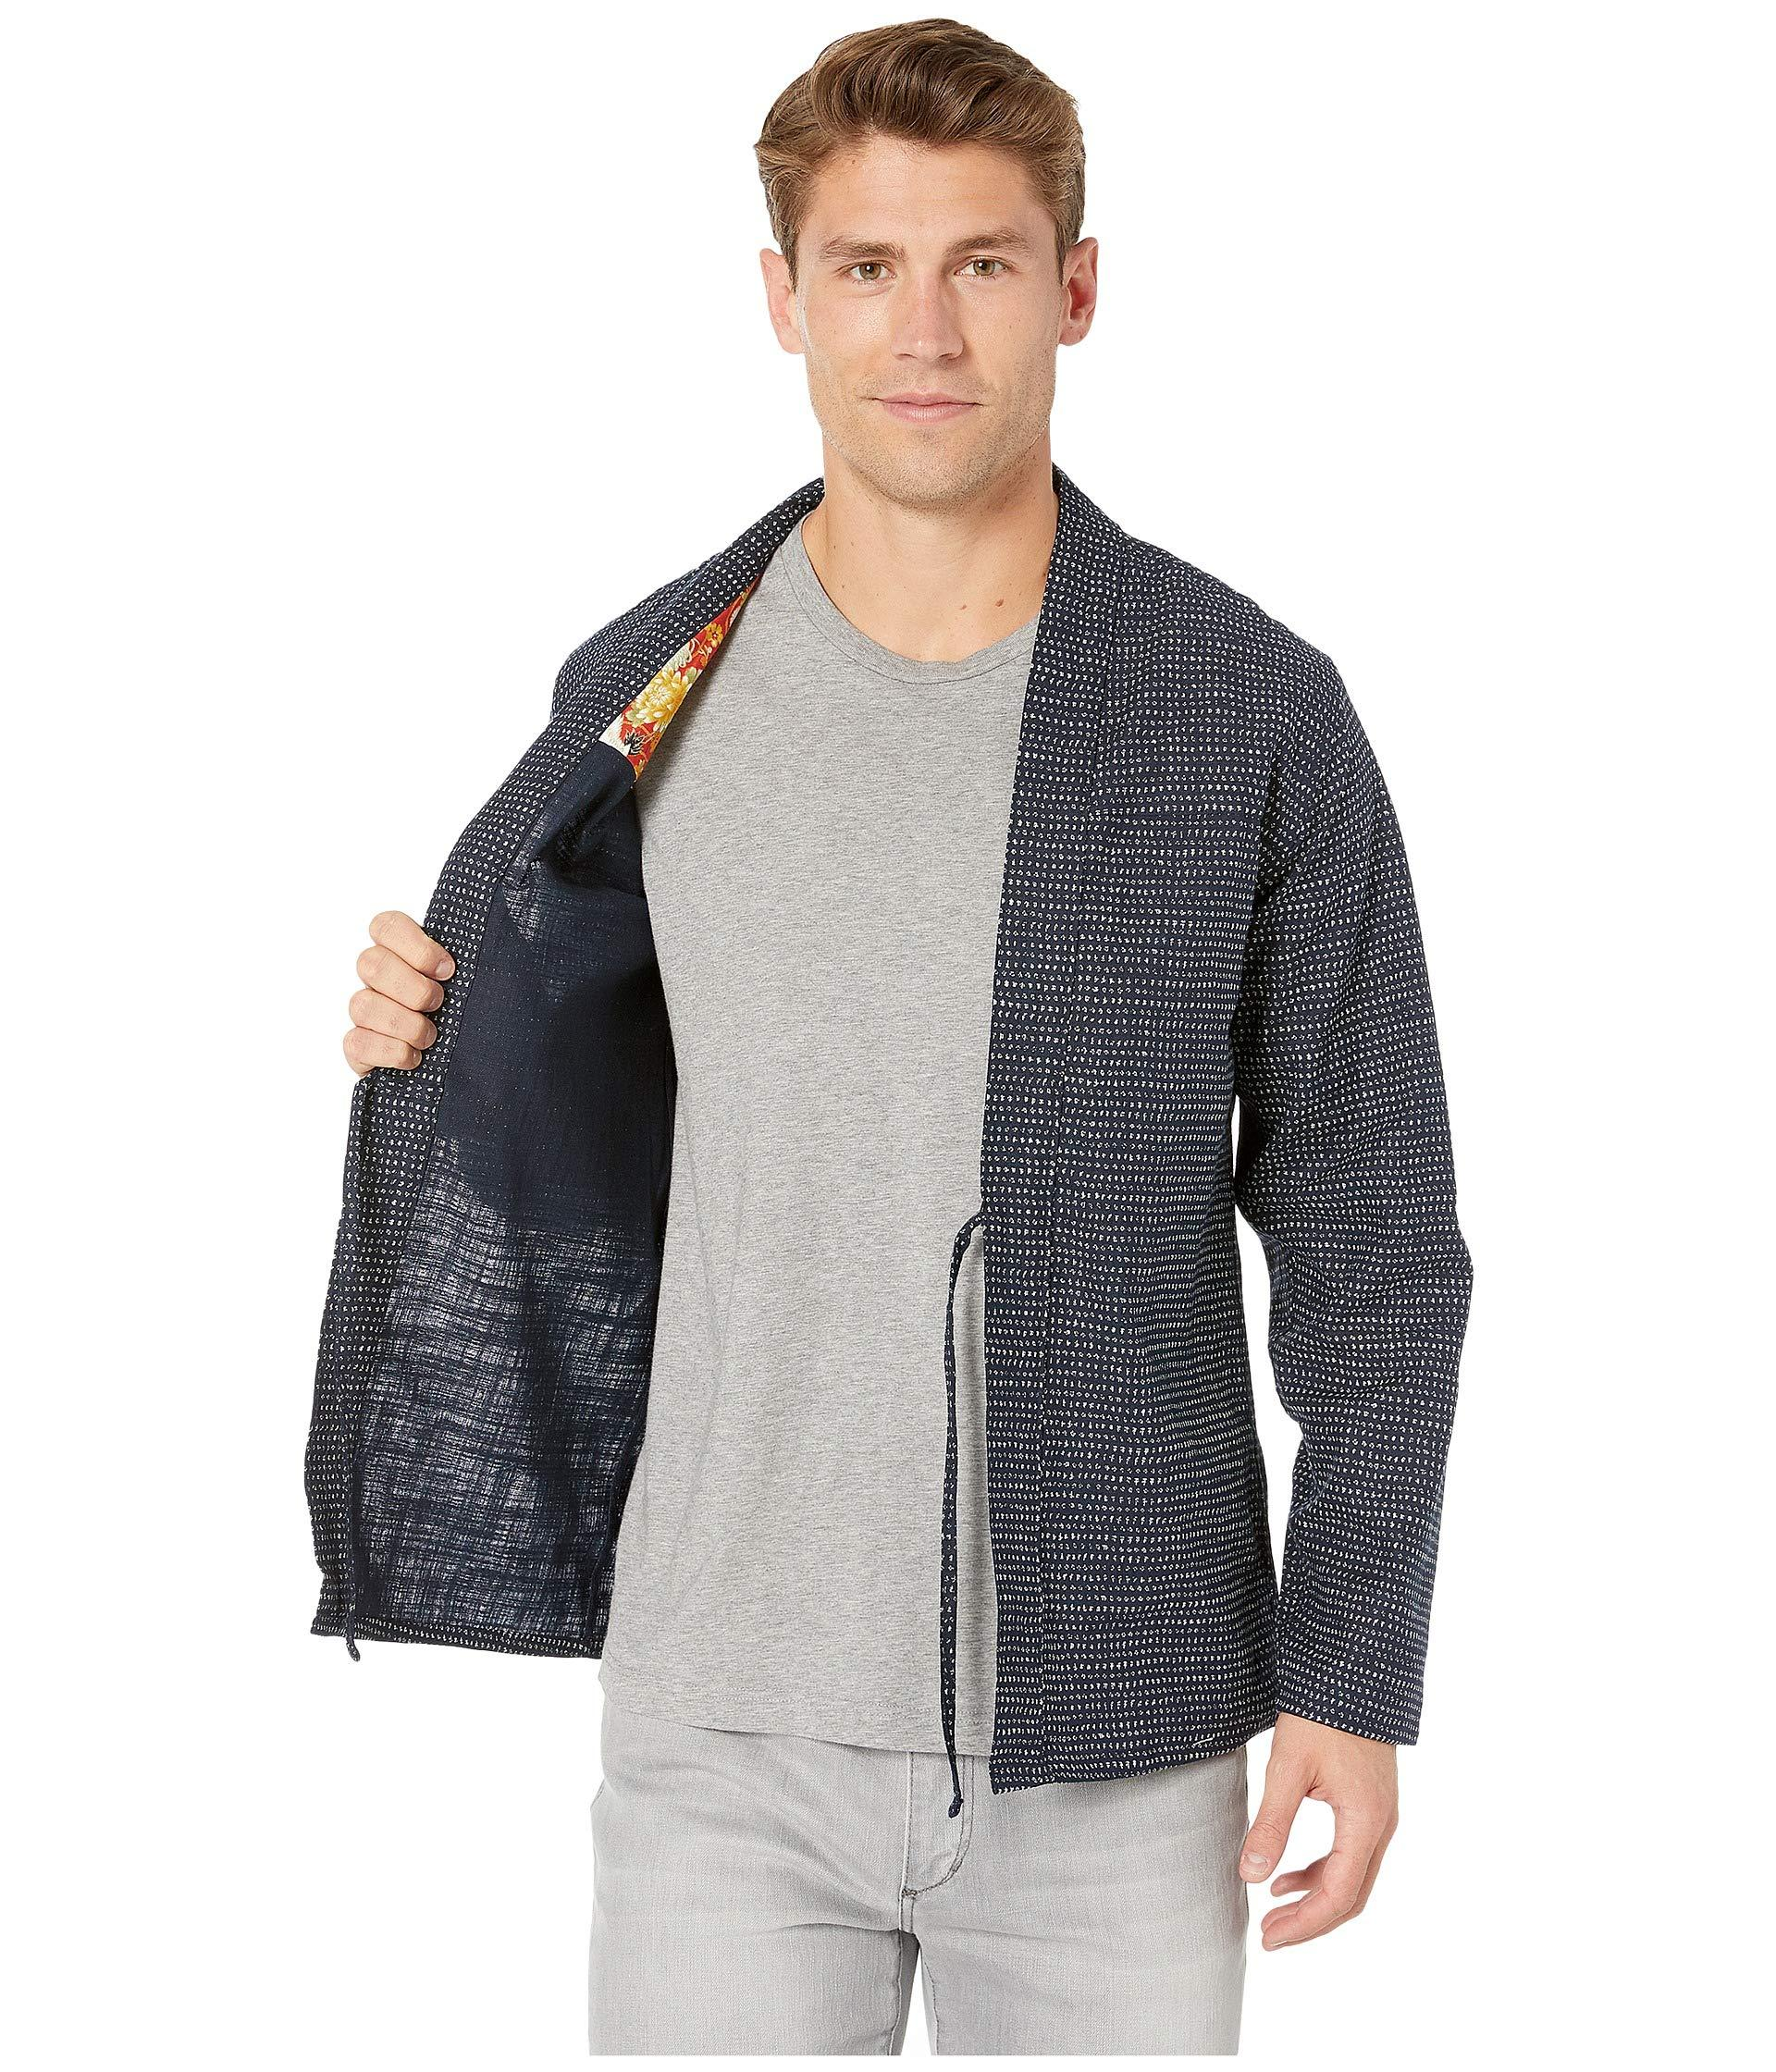 805d1c203b ... Shirt (kimono Chon indigo) Men s Clothing for. View fullscreen